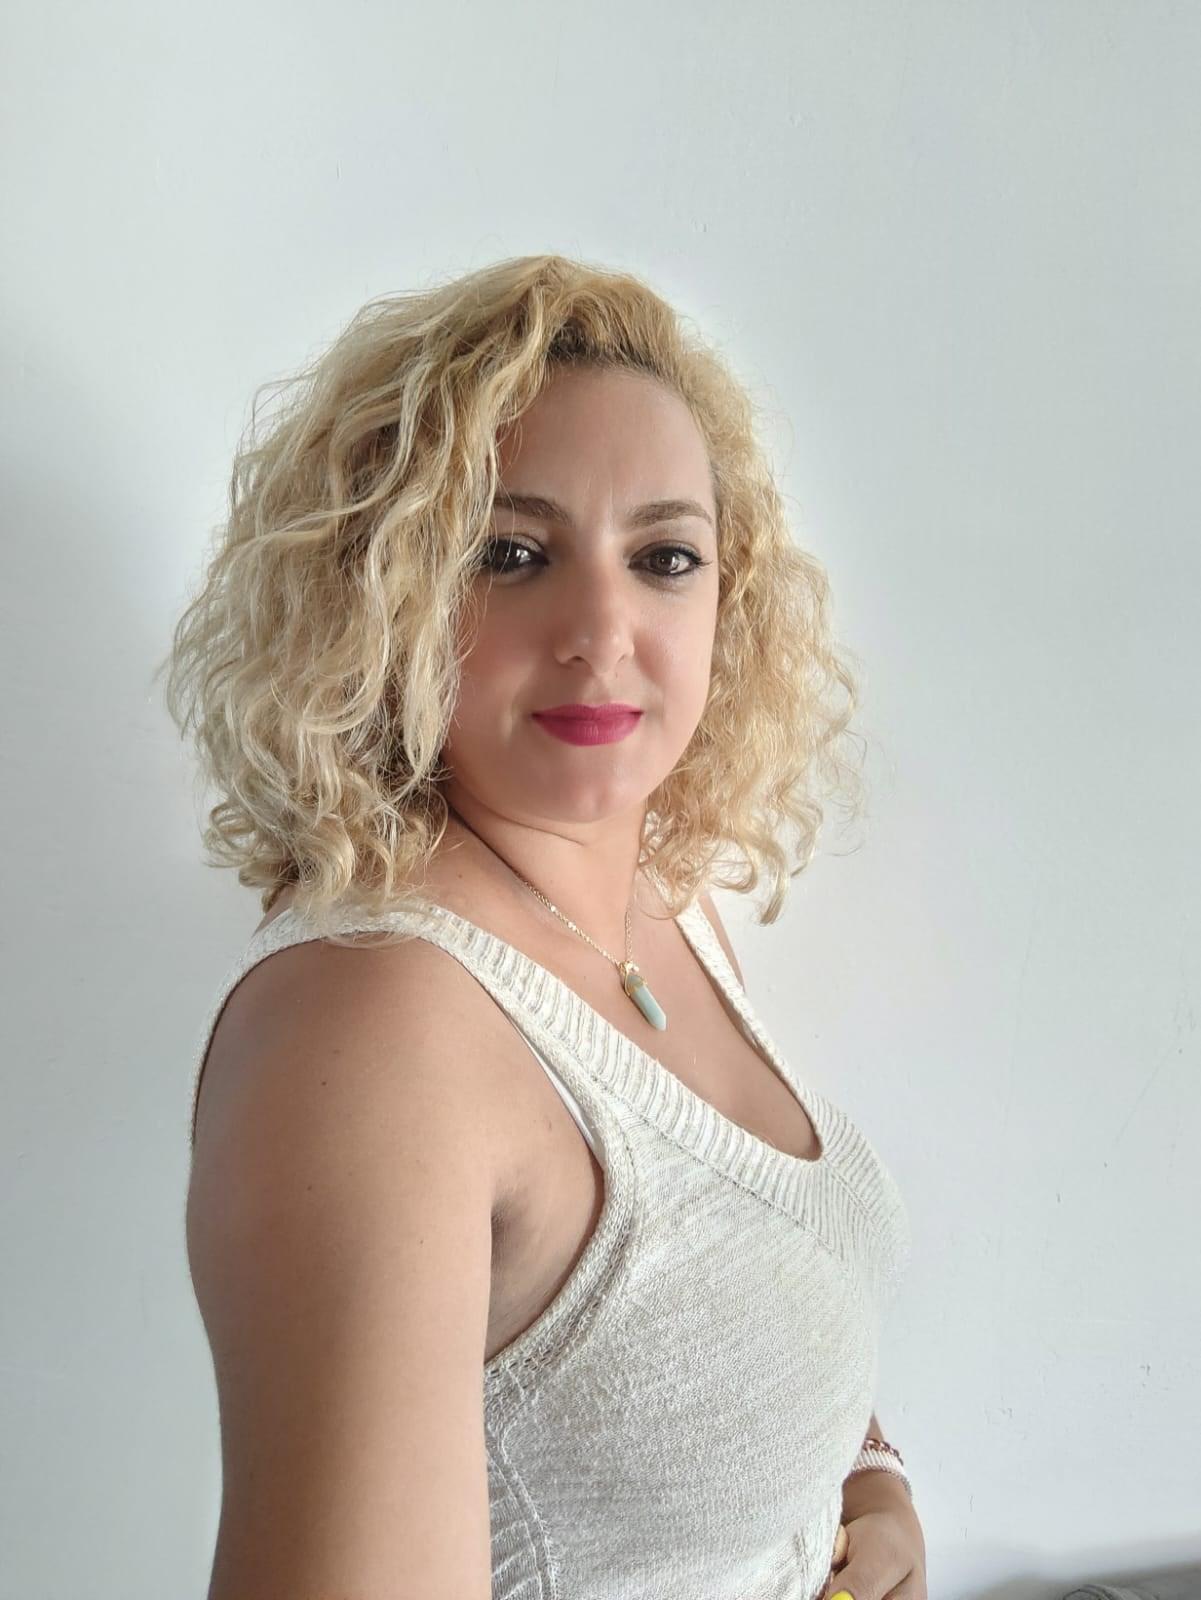 Esther Ramos Fuentes